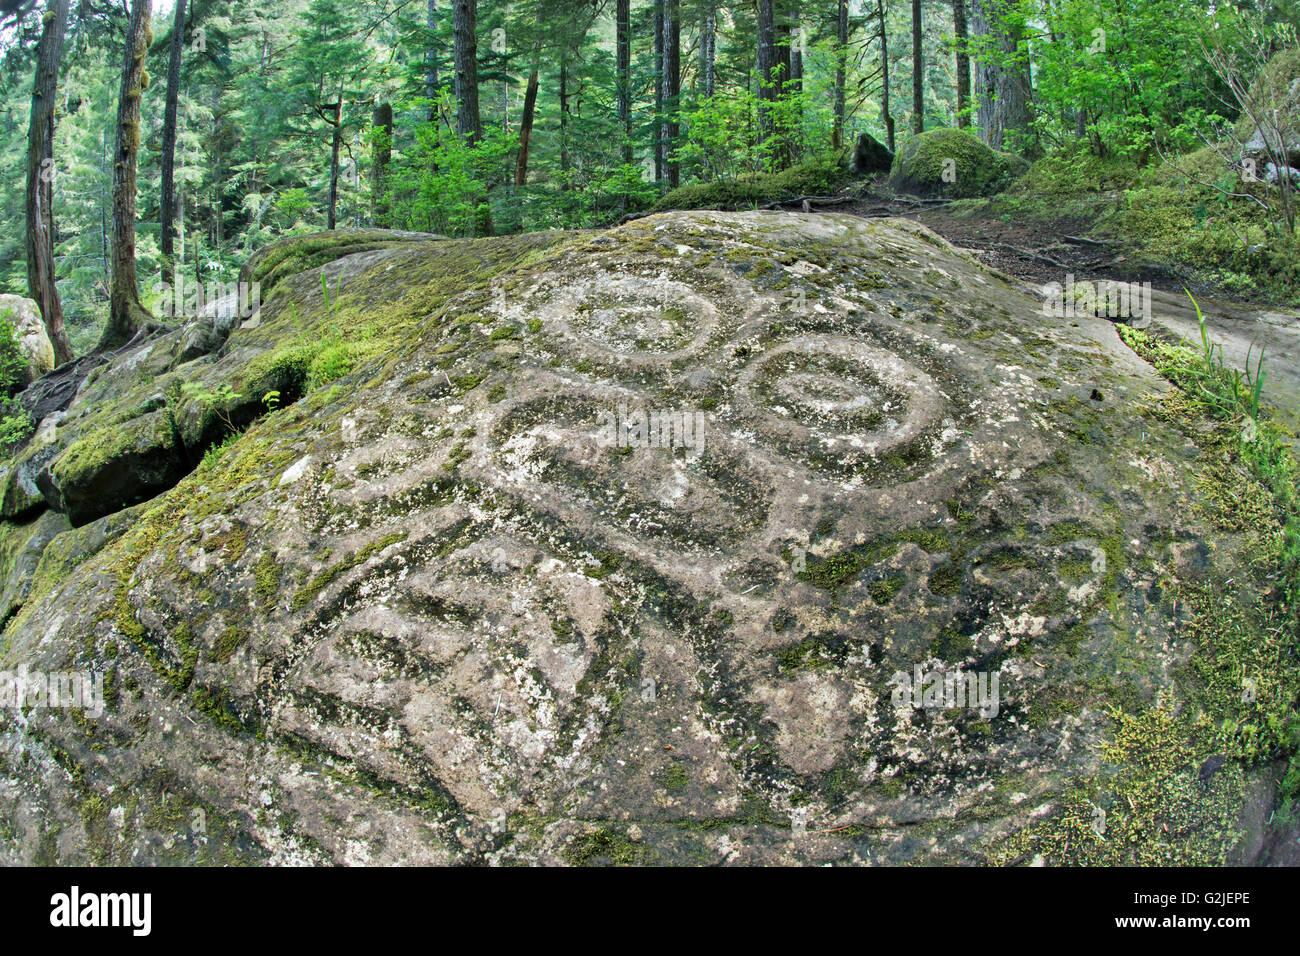 Nuxalk petroglyphs, temperate rainforest, Bella Coola, coastal British Columbia - Stock Image